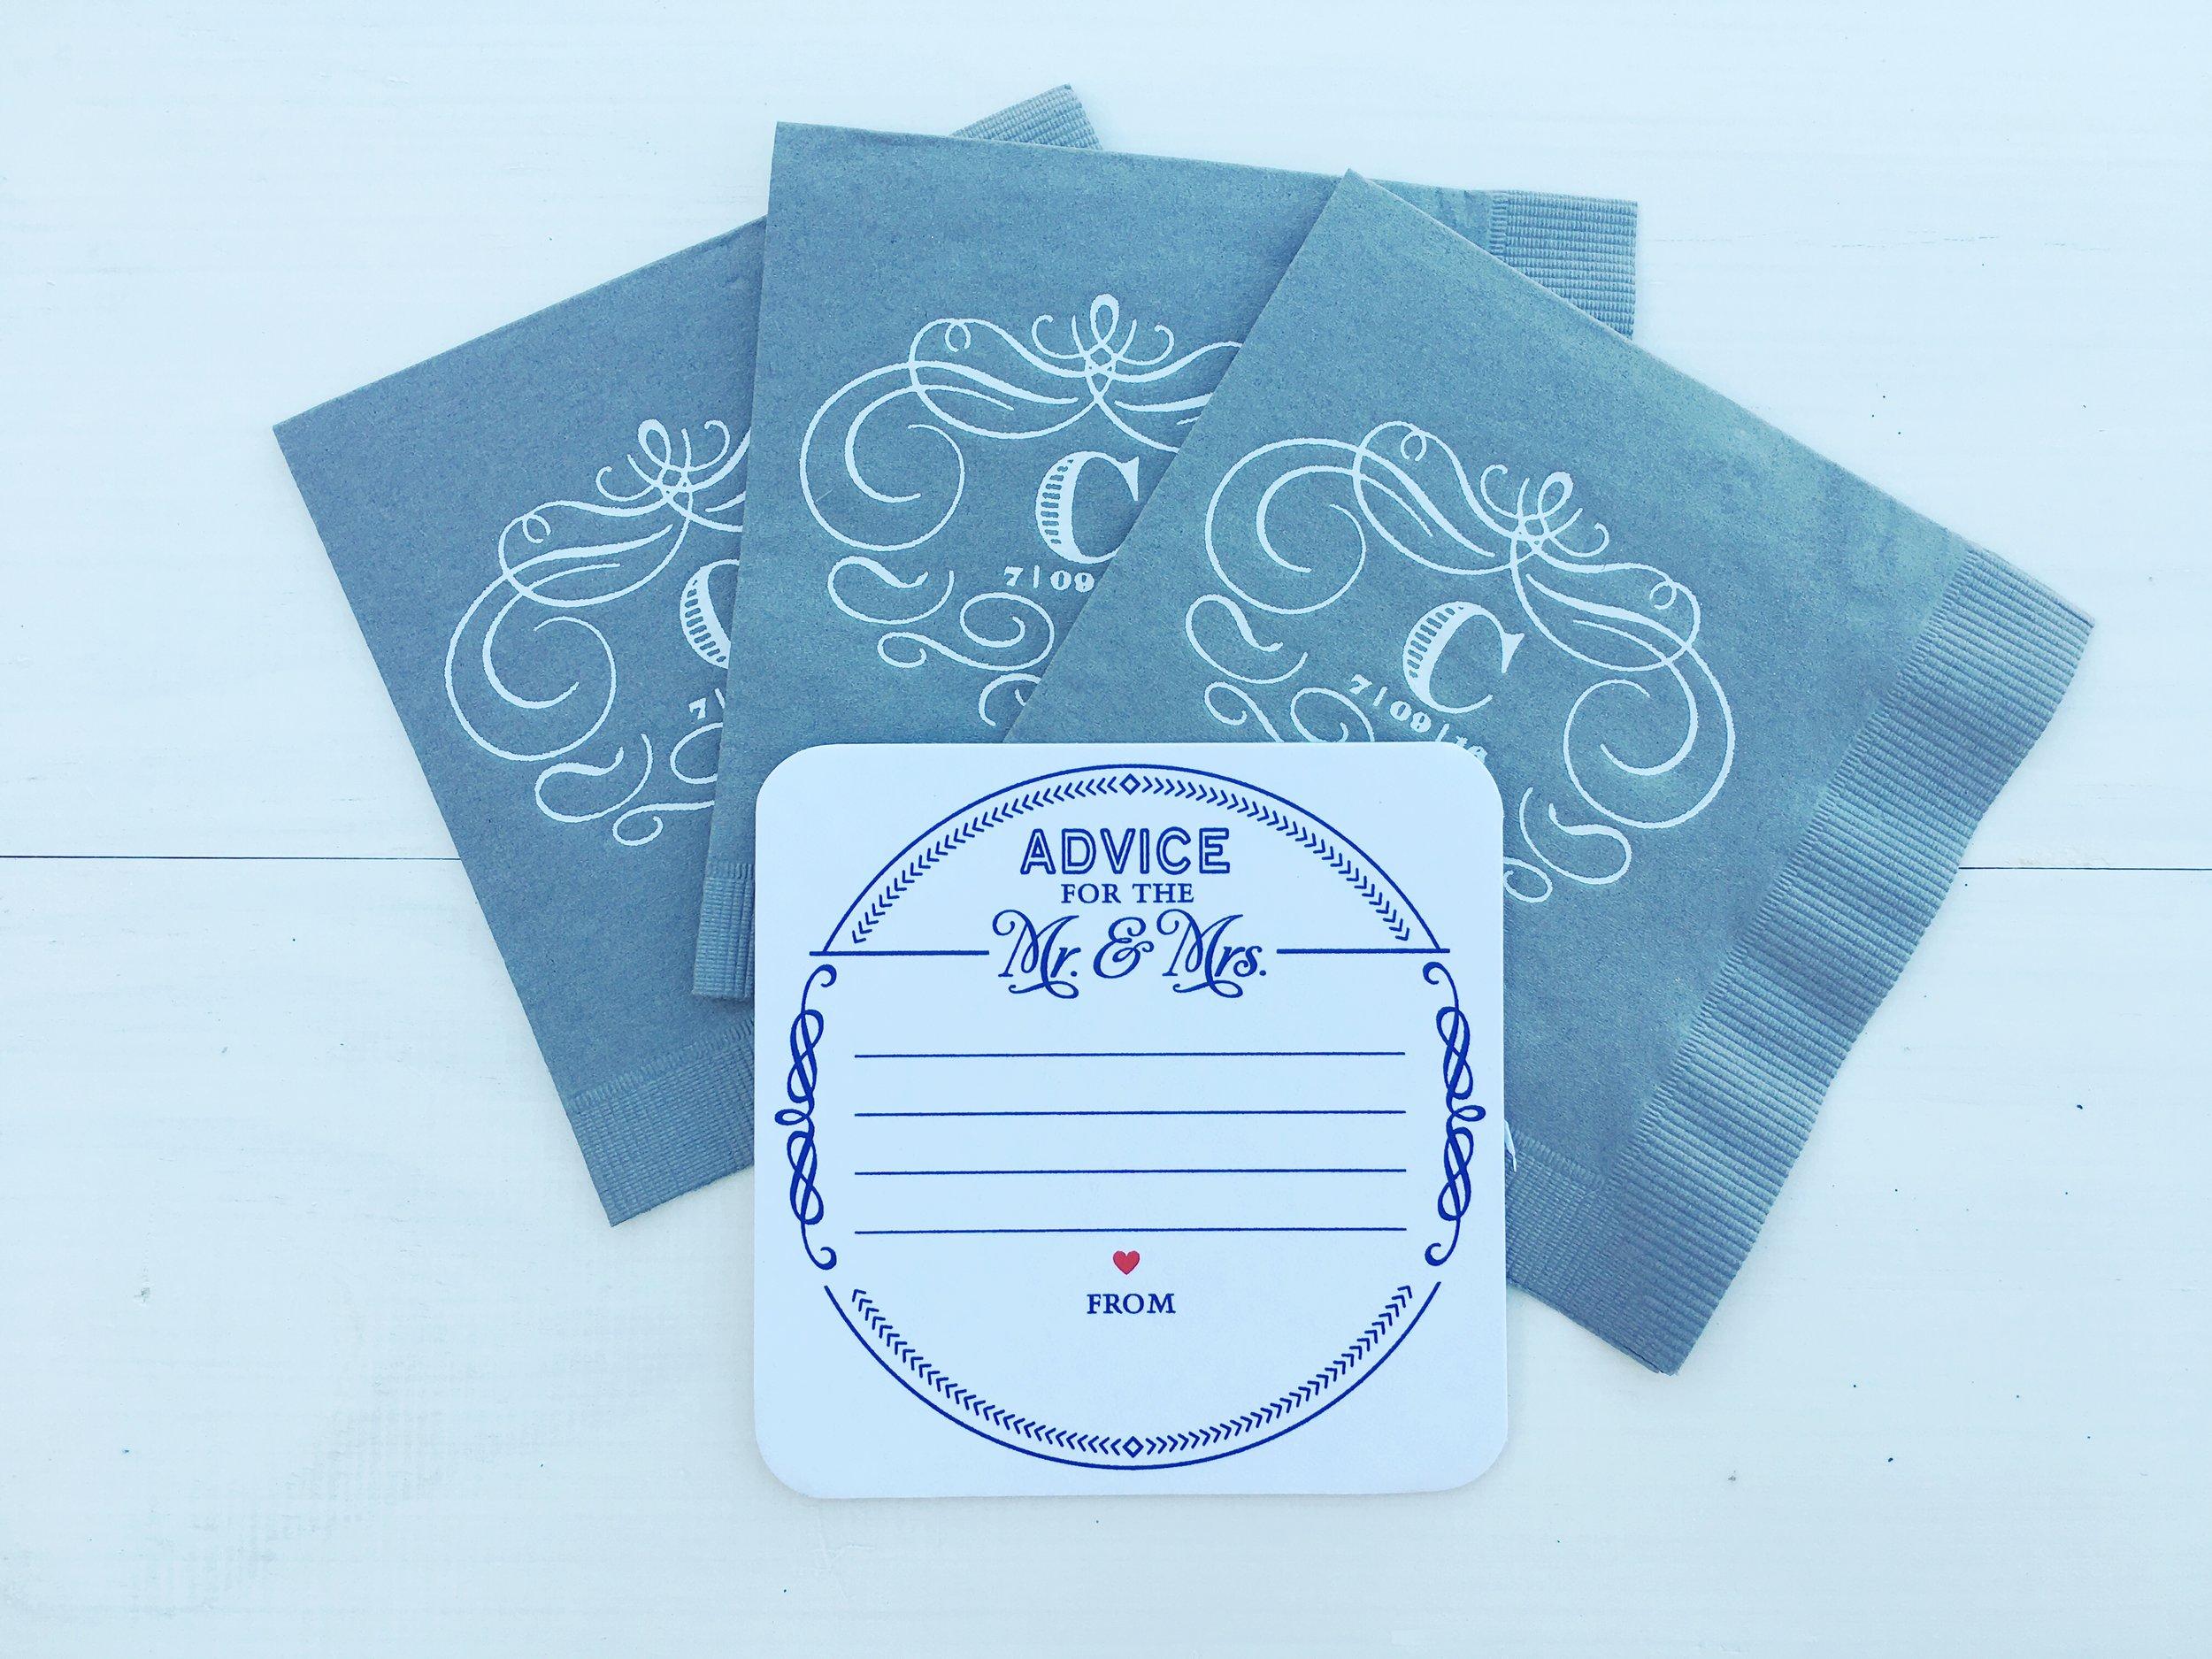 Custom pressed napkins